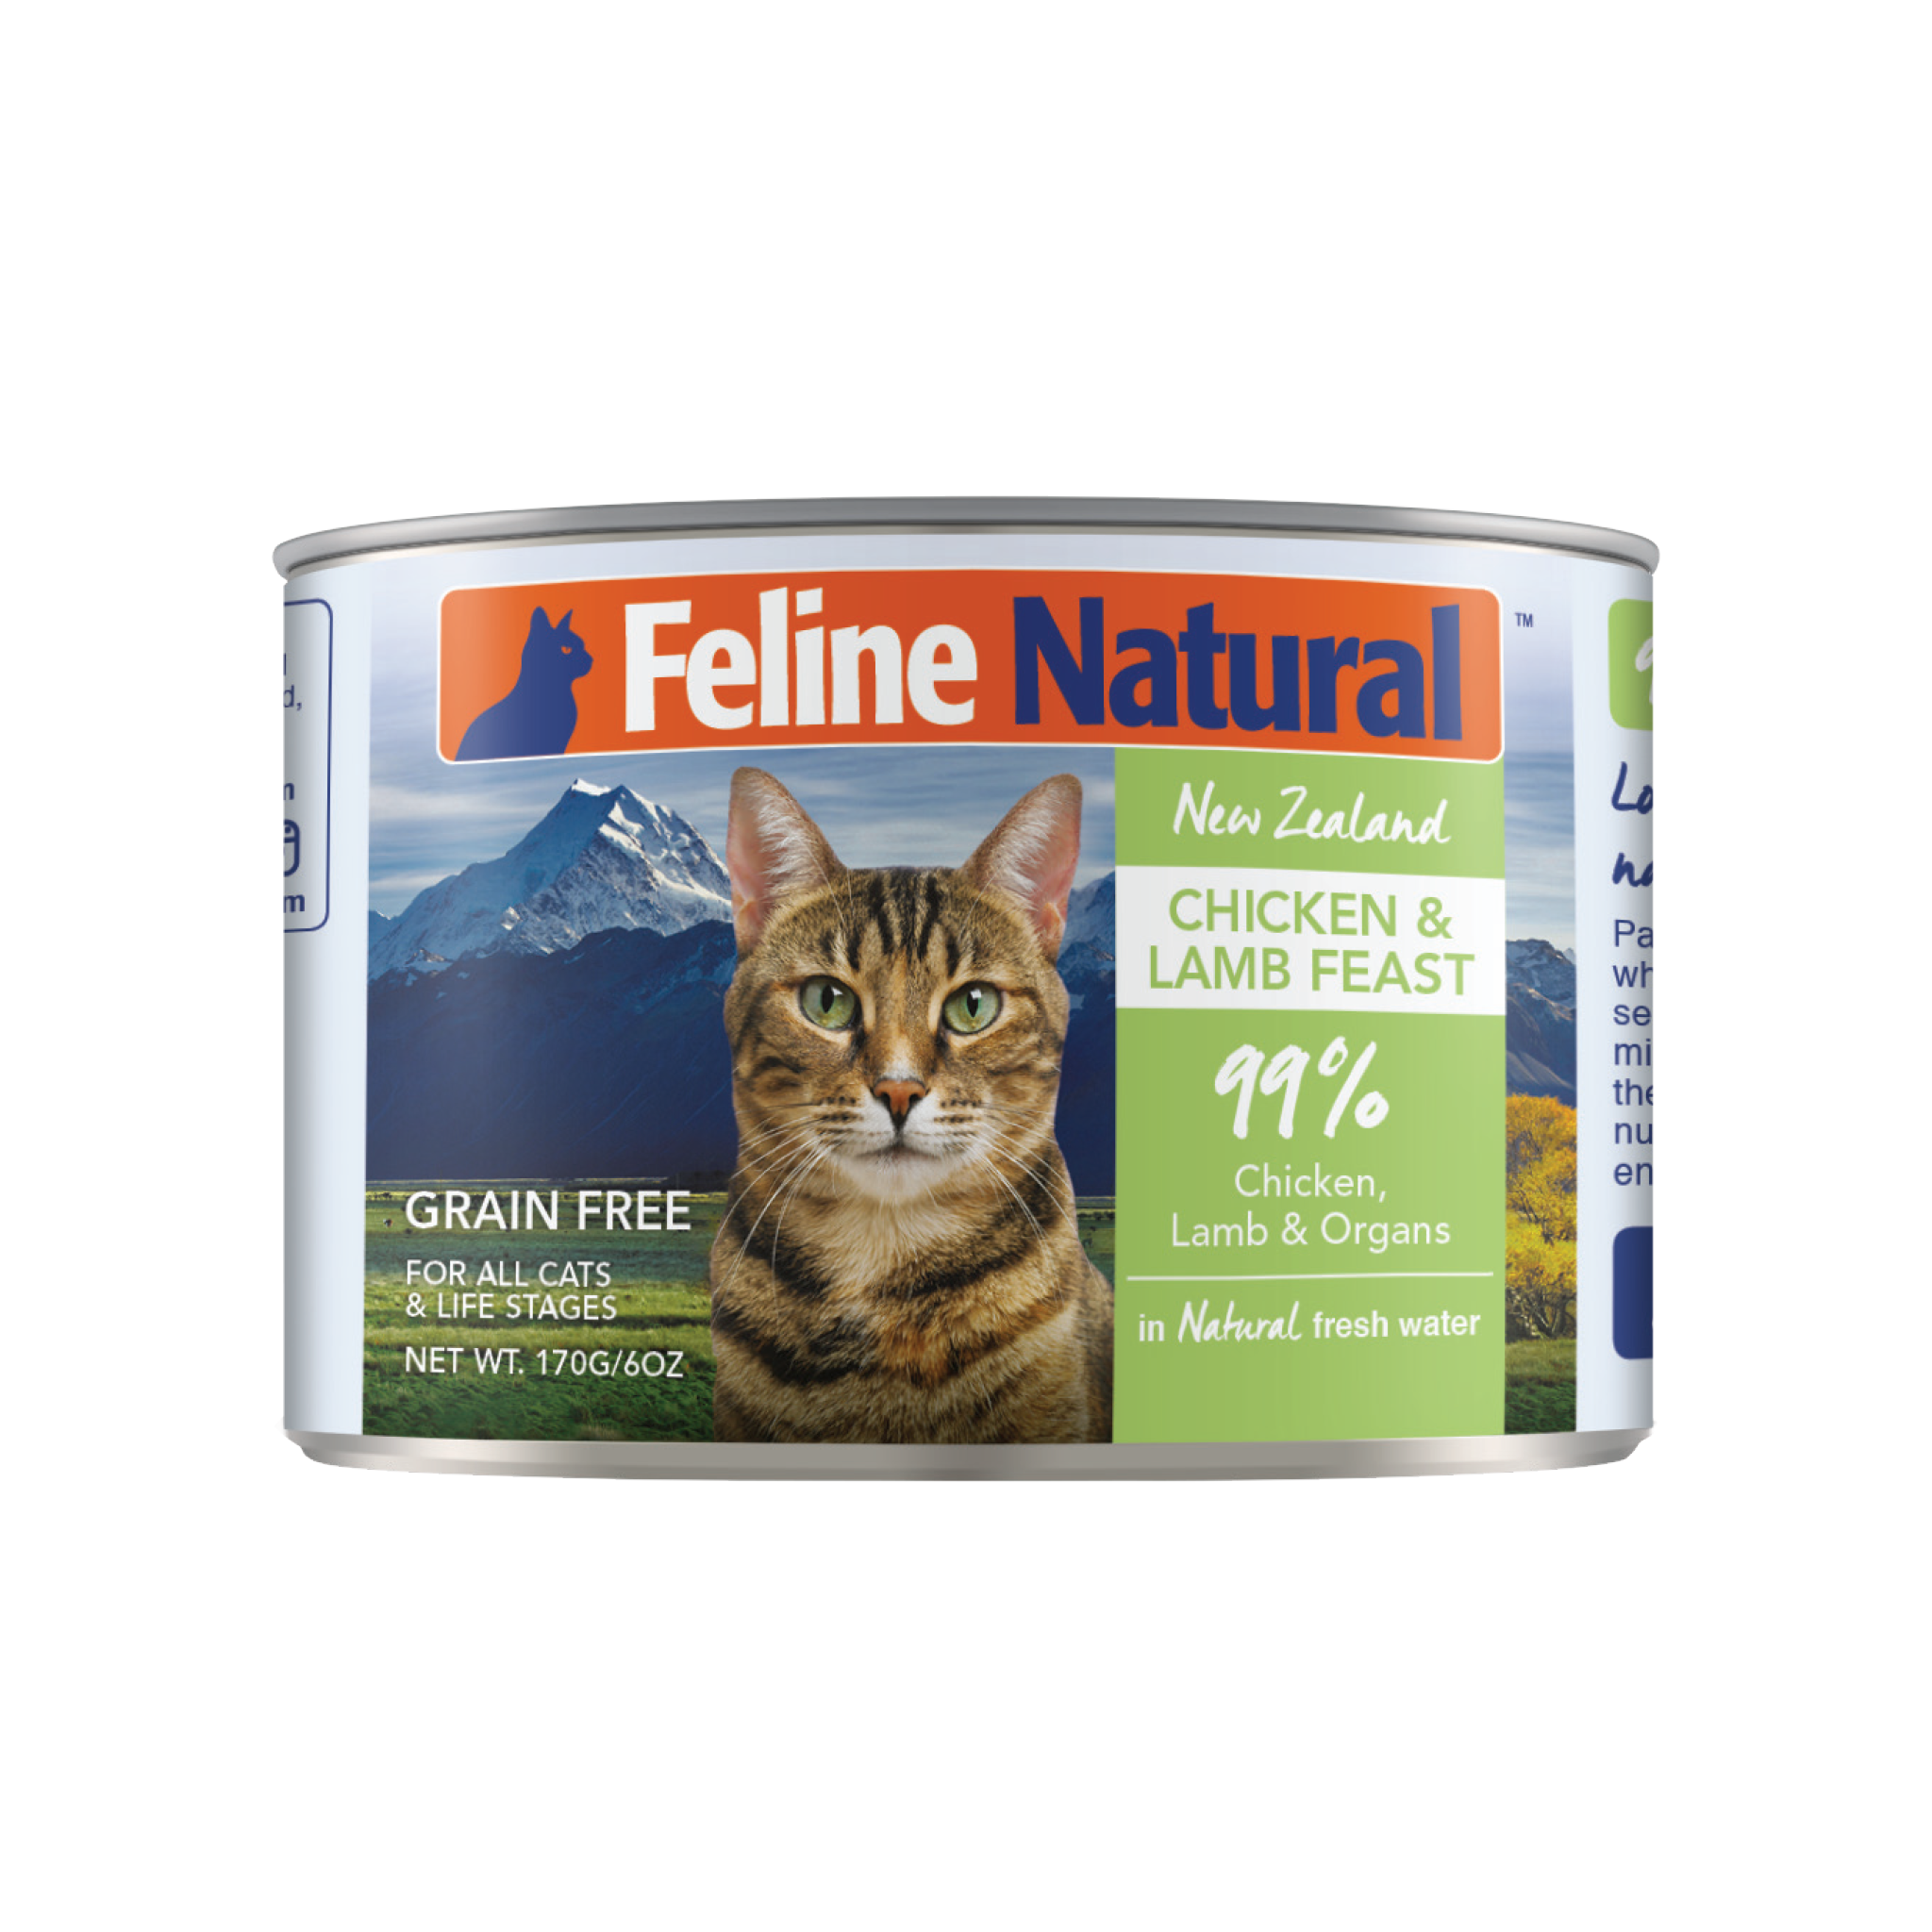 Feline Natural Feline Natural Chicken & Lamb Feast Wet Cat Food 3oz